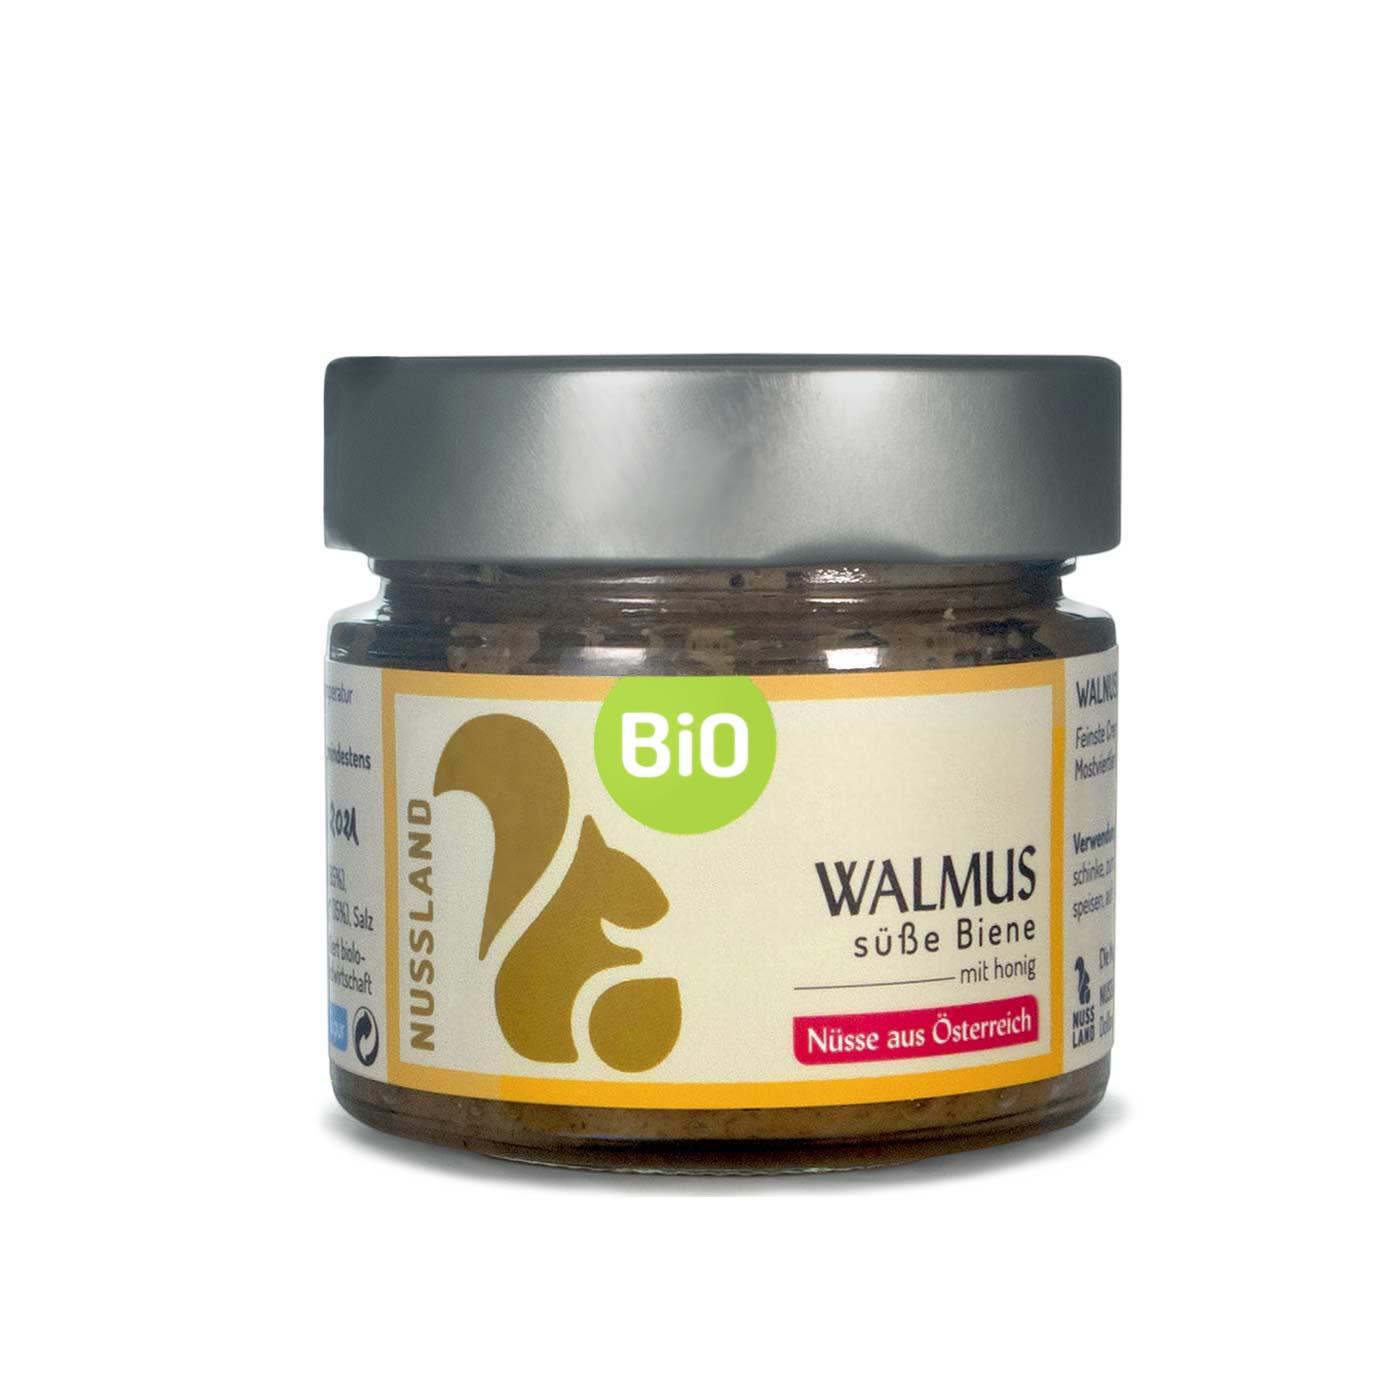 BIO Walnuss-Mus 'Süße Biene'